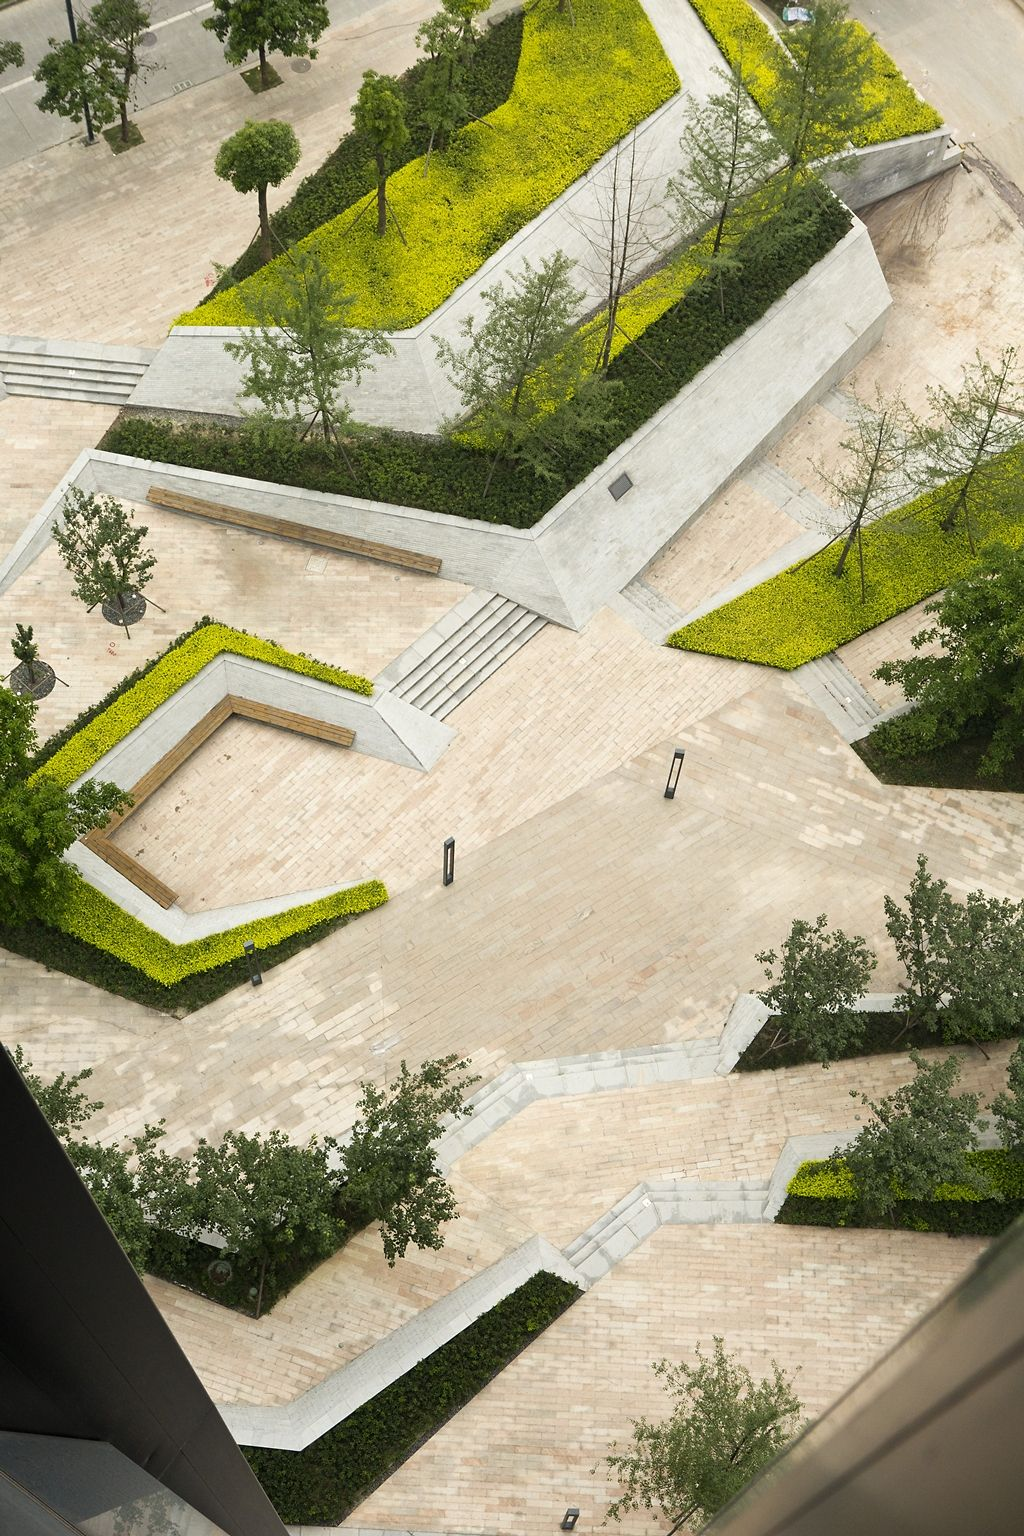 Urban Space. More - Fantasia Mixed-Use Landscape Garden Landscape Architecture